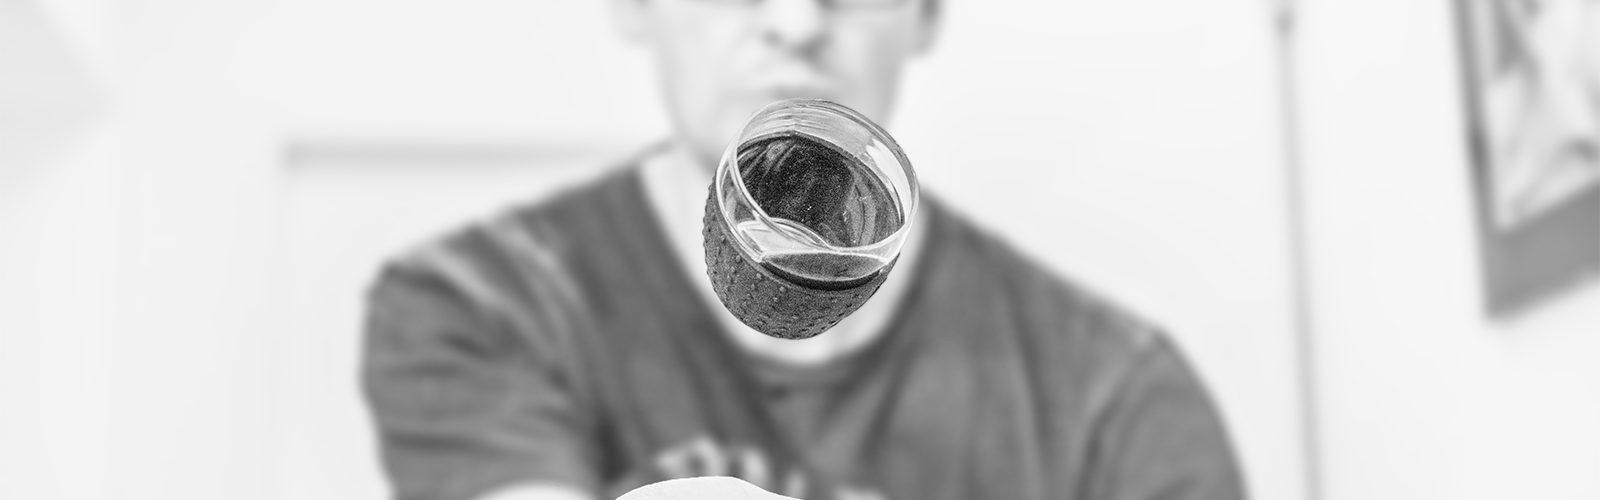 Levitation Espresso-Tasse Endergebnis | Norbert Eder Photography